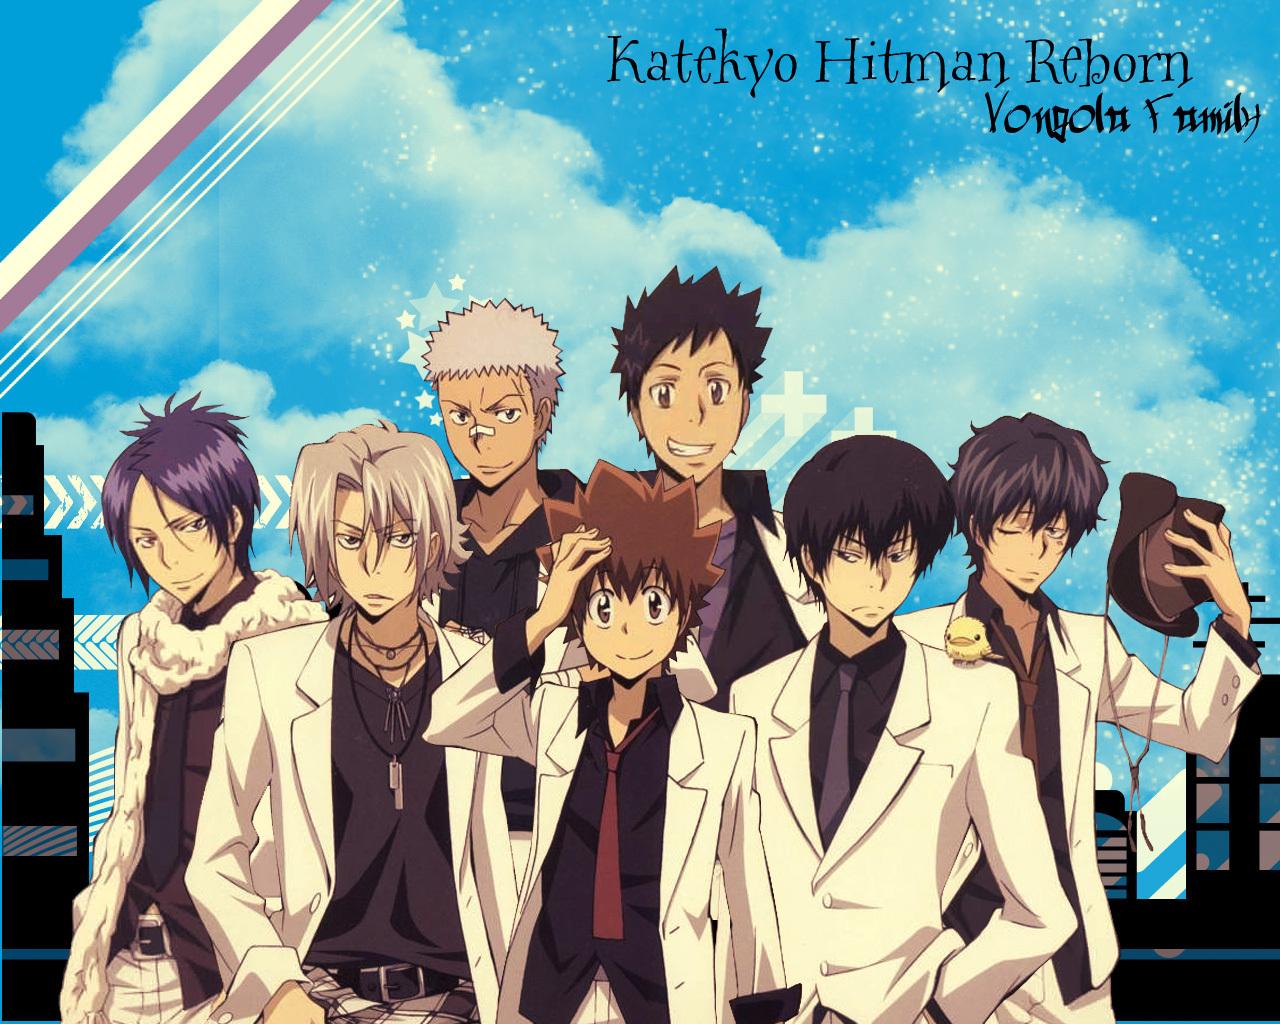 un Post de Wallpapers de mi anime favorito Katekyo Hitman Reborn 1280x1024